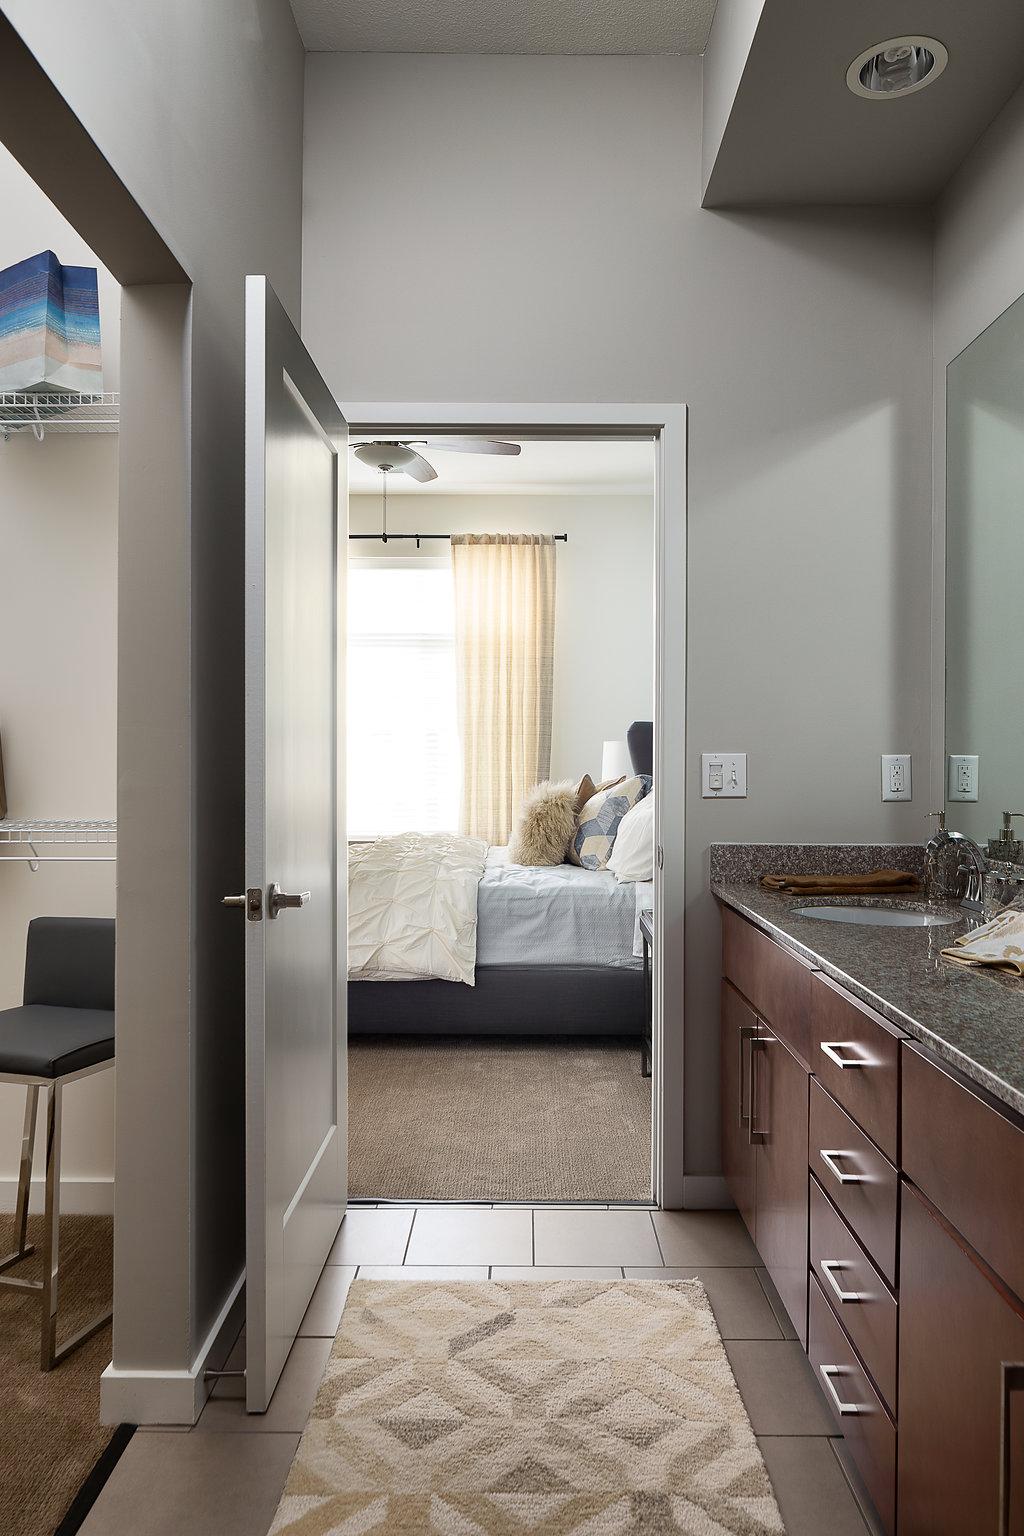 Bathroom with Granite Double Vanity at Domain City Center Luxury Apartments in Lenexa, Kansas